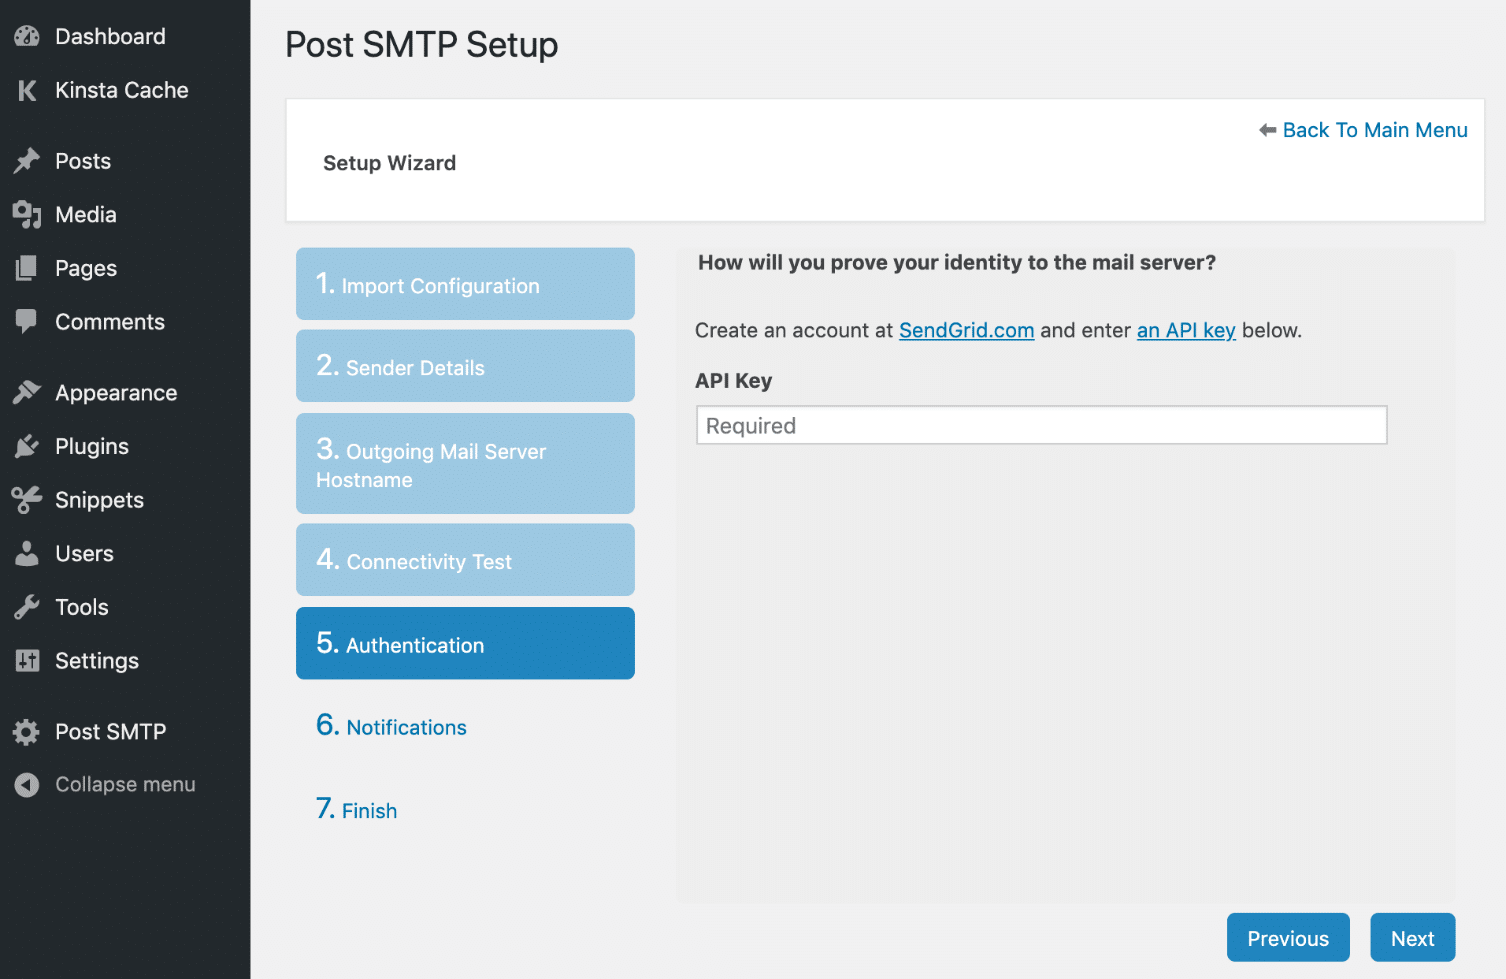 Chave API do SendGrid no Post SMTP